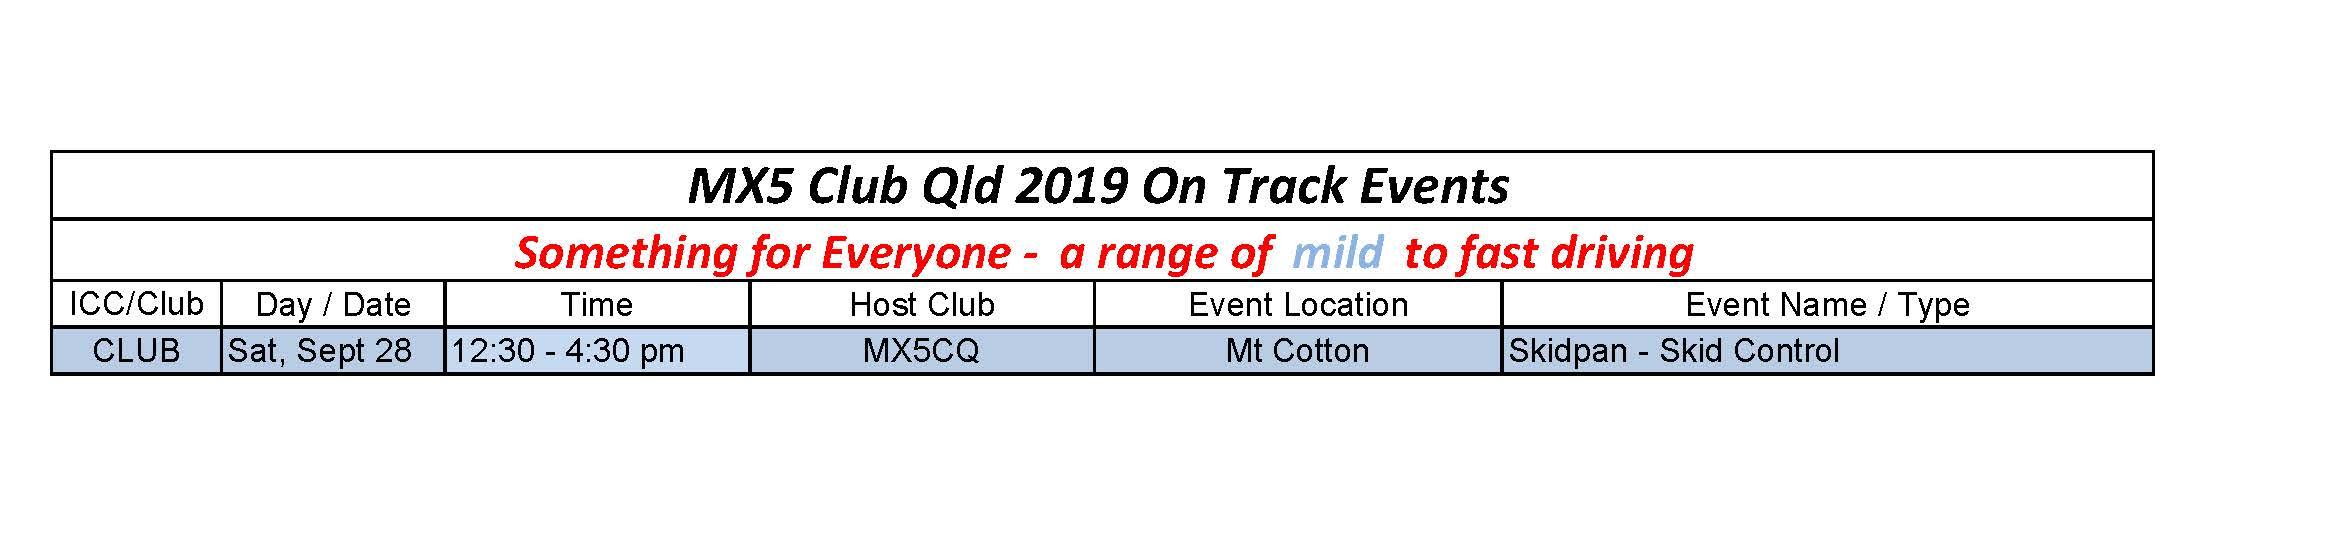 11 Compsec Motor Sport Dates 2019.jpg